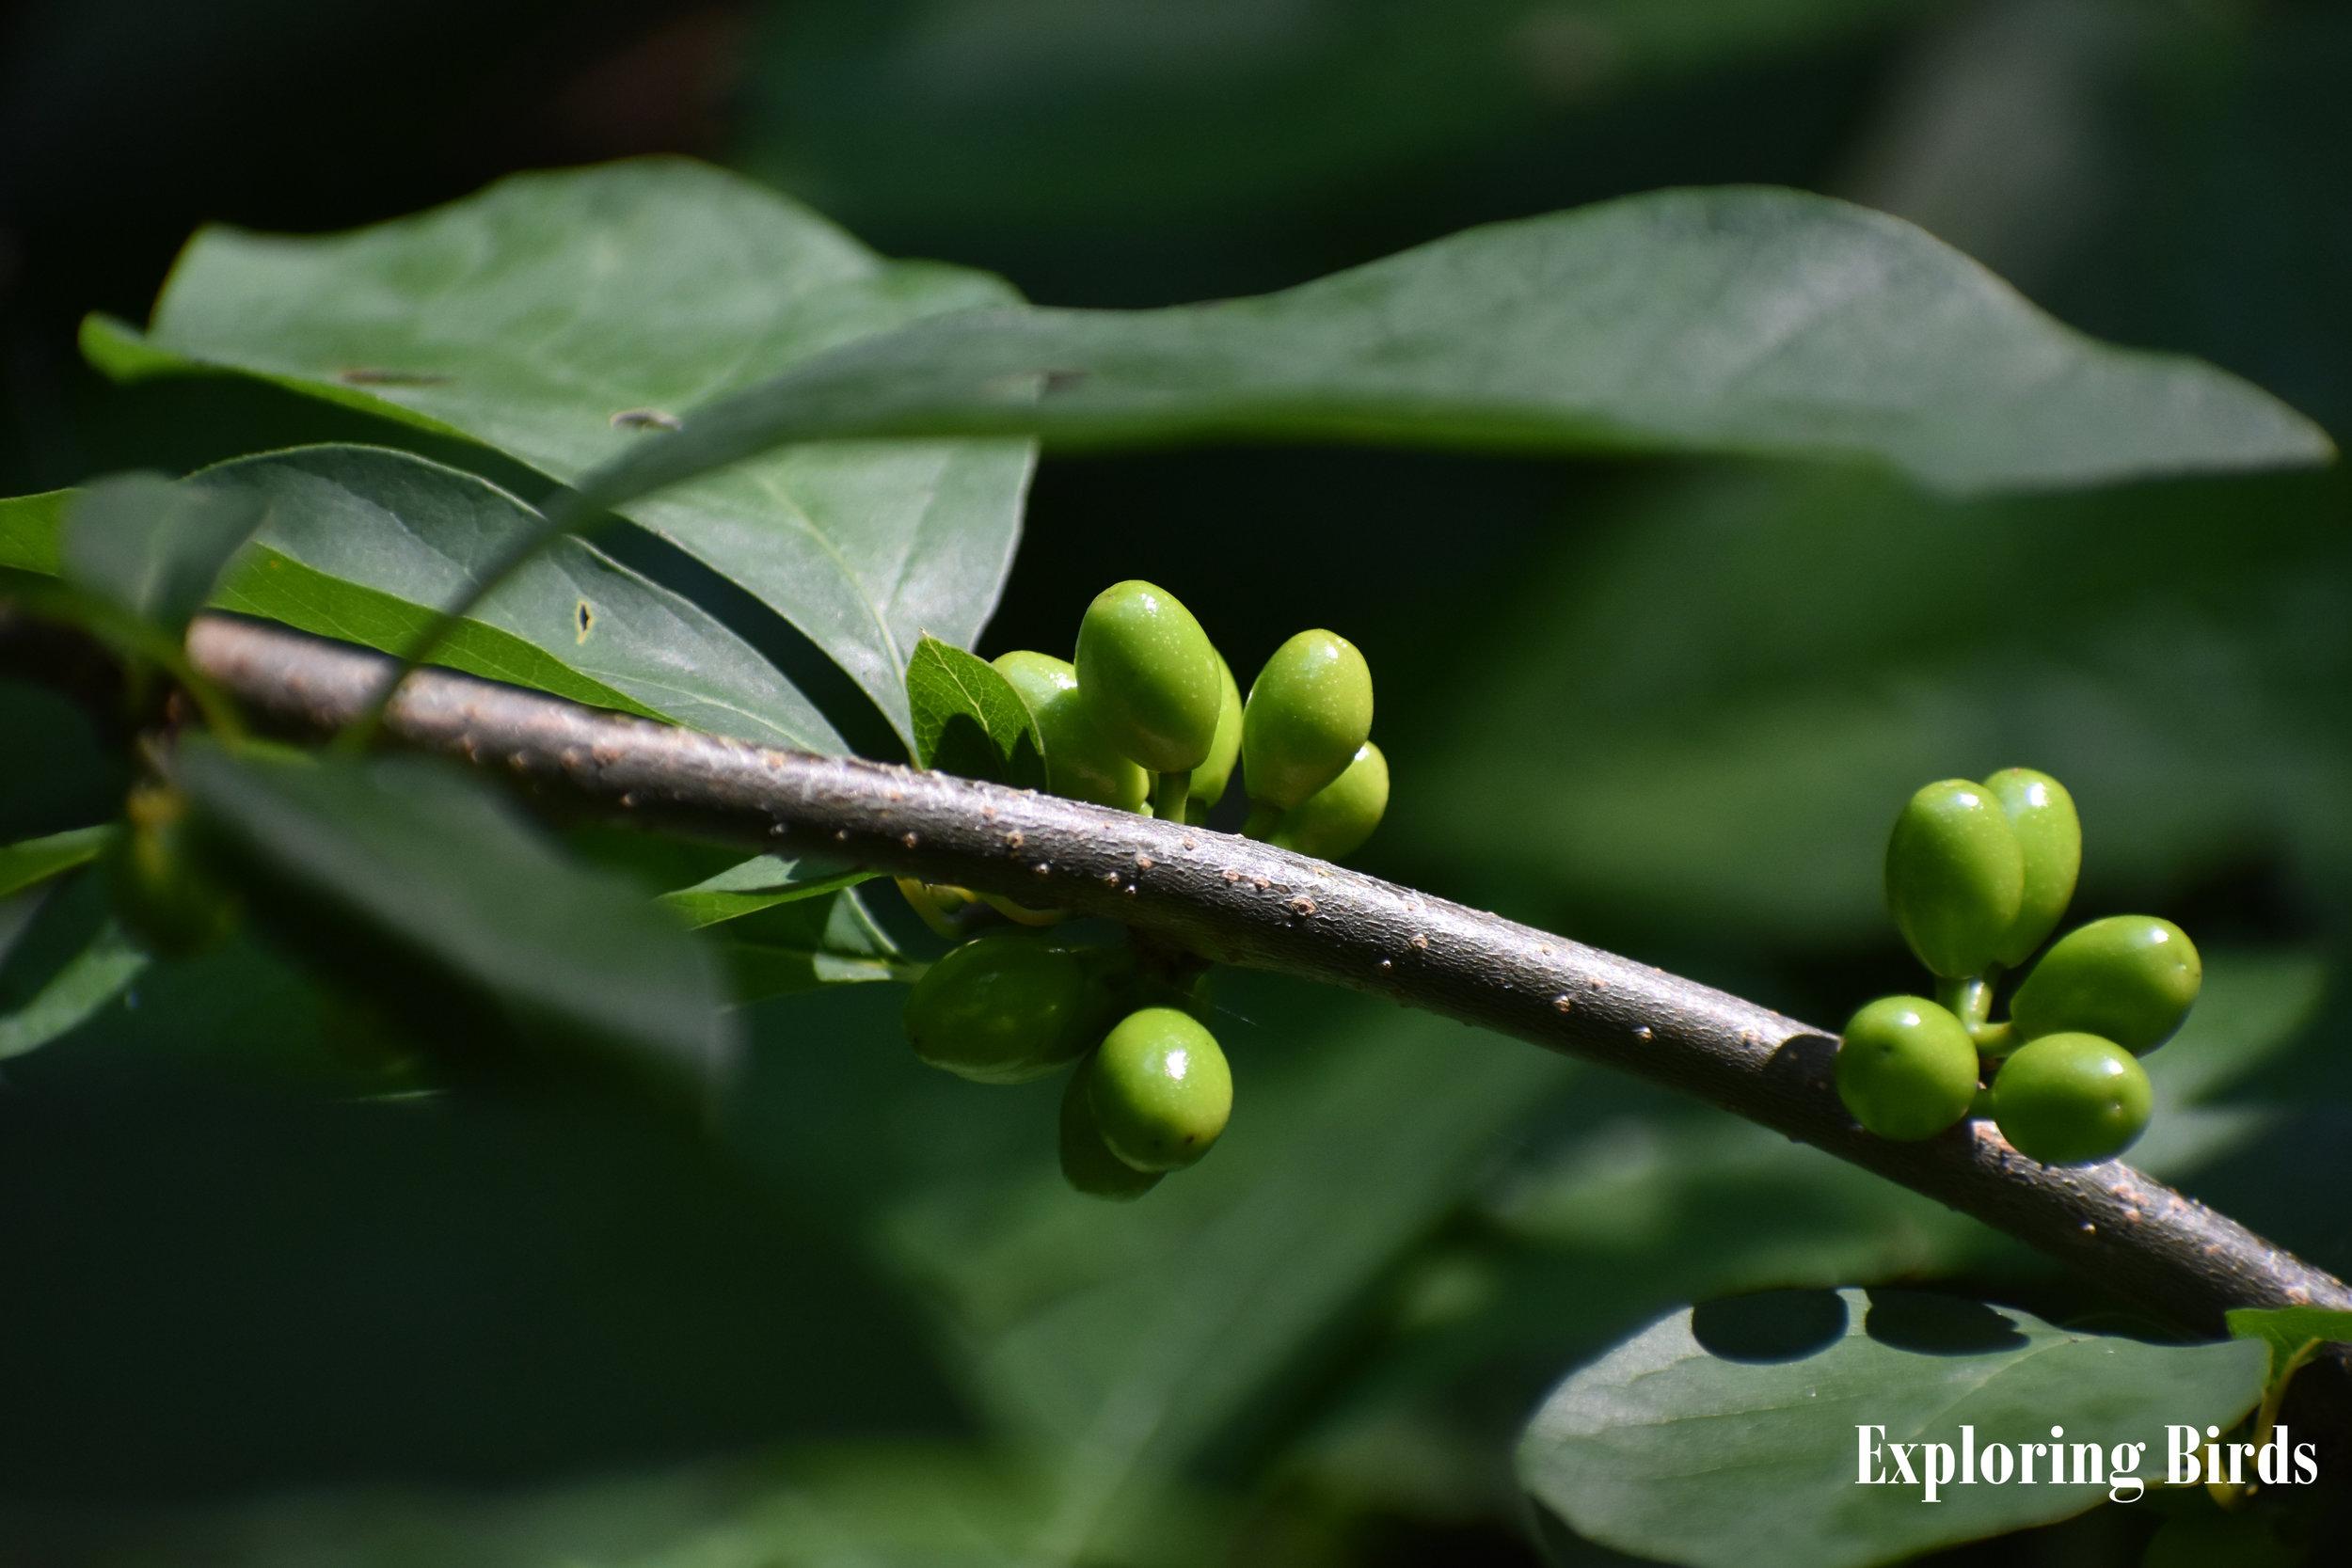 Spicebush berries (unripe)